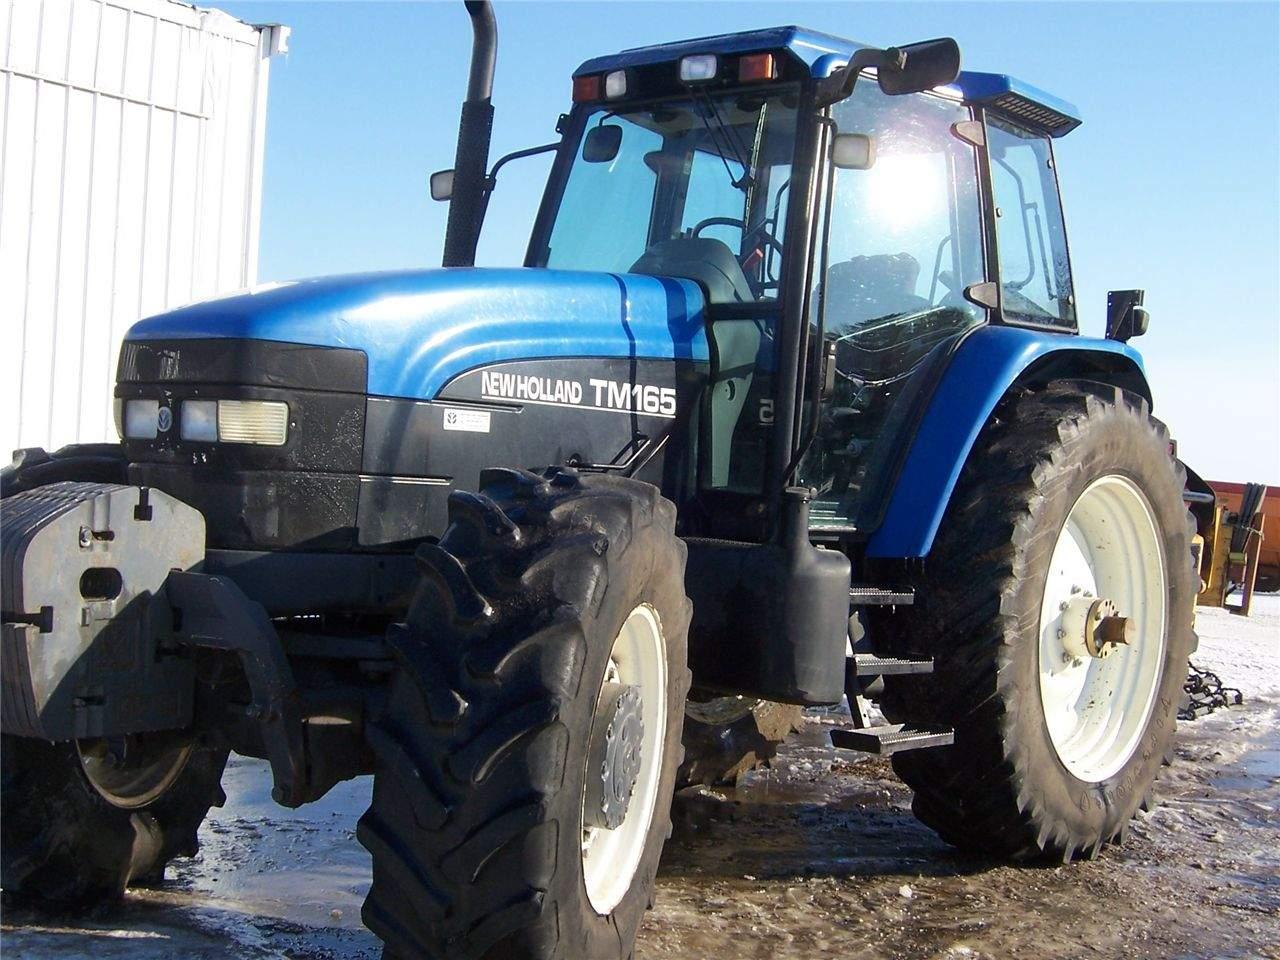 avis tm165 de la marque new holland tracteurs agricoles. Black Bedroom Furniture Sets. Home Design Ideas